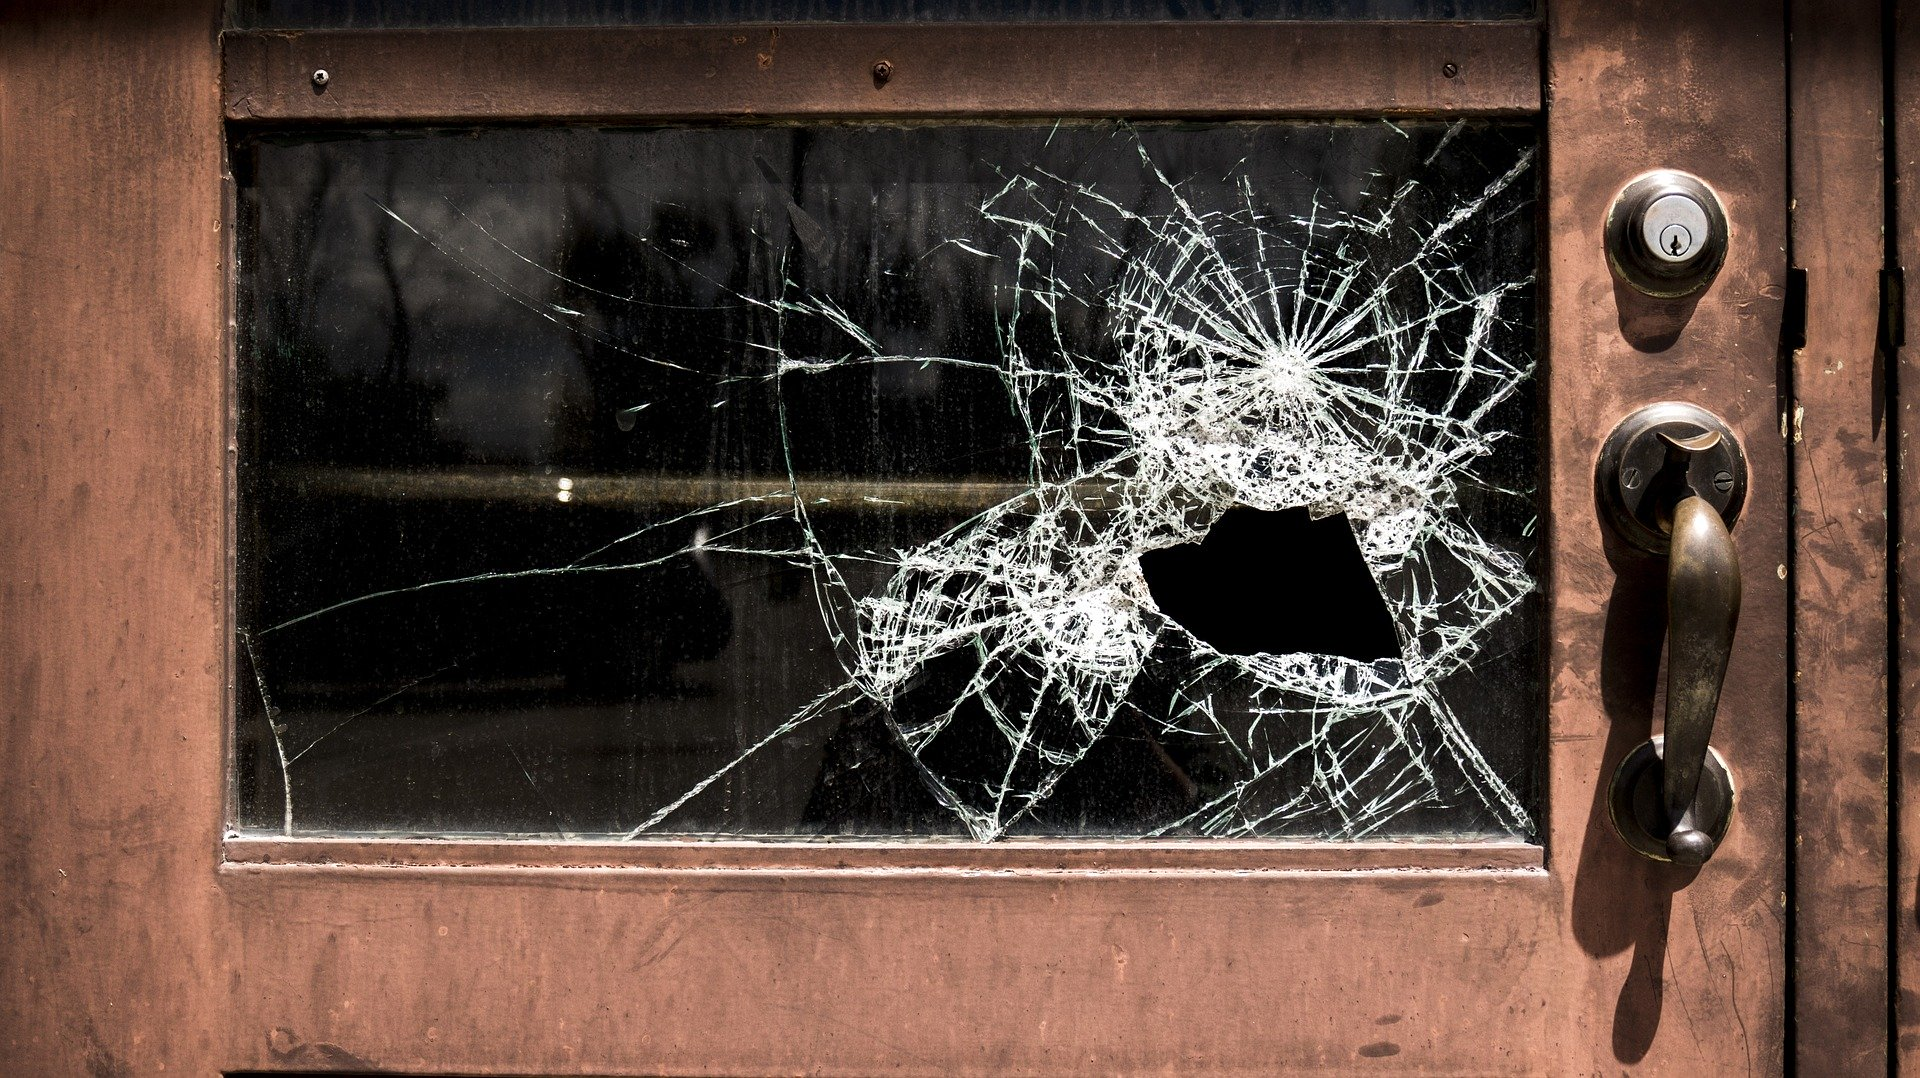 Vandalized window